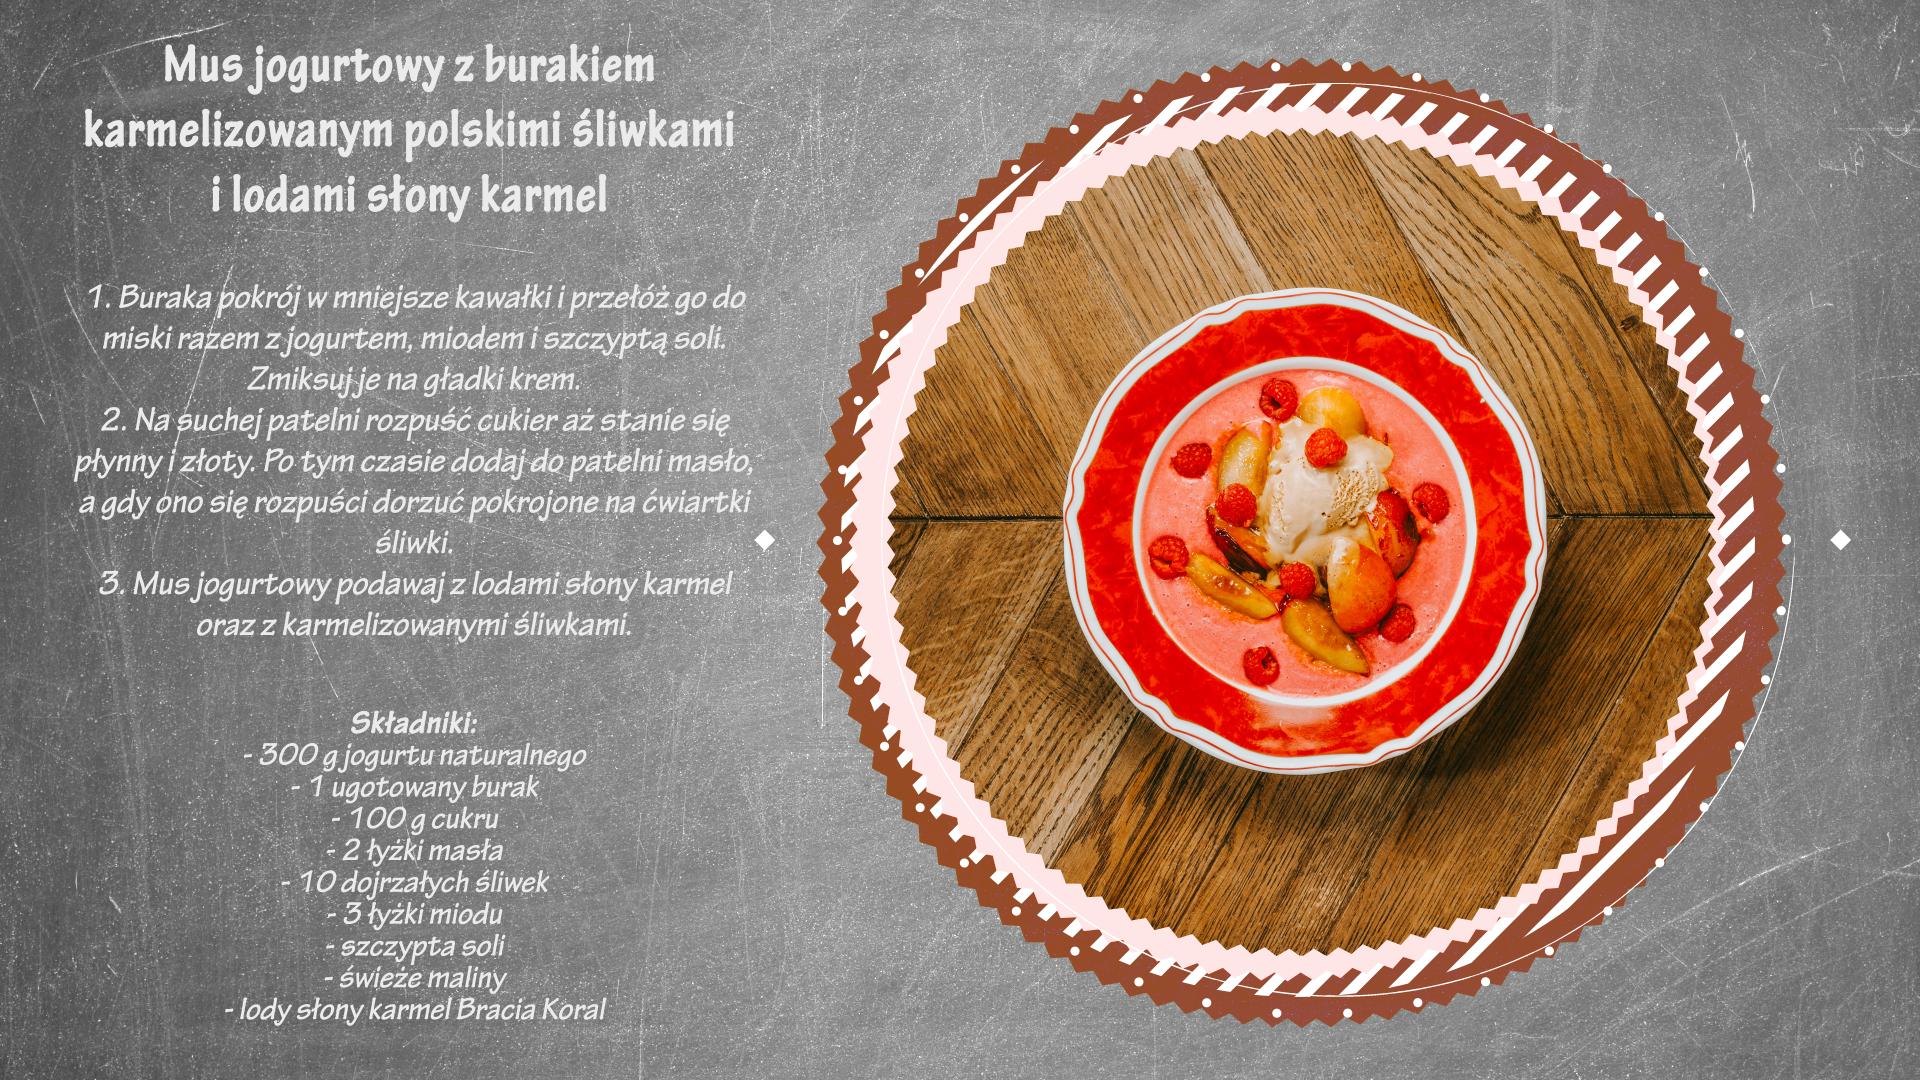 Pomysł na jesienne desery od marki Bracia Koral